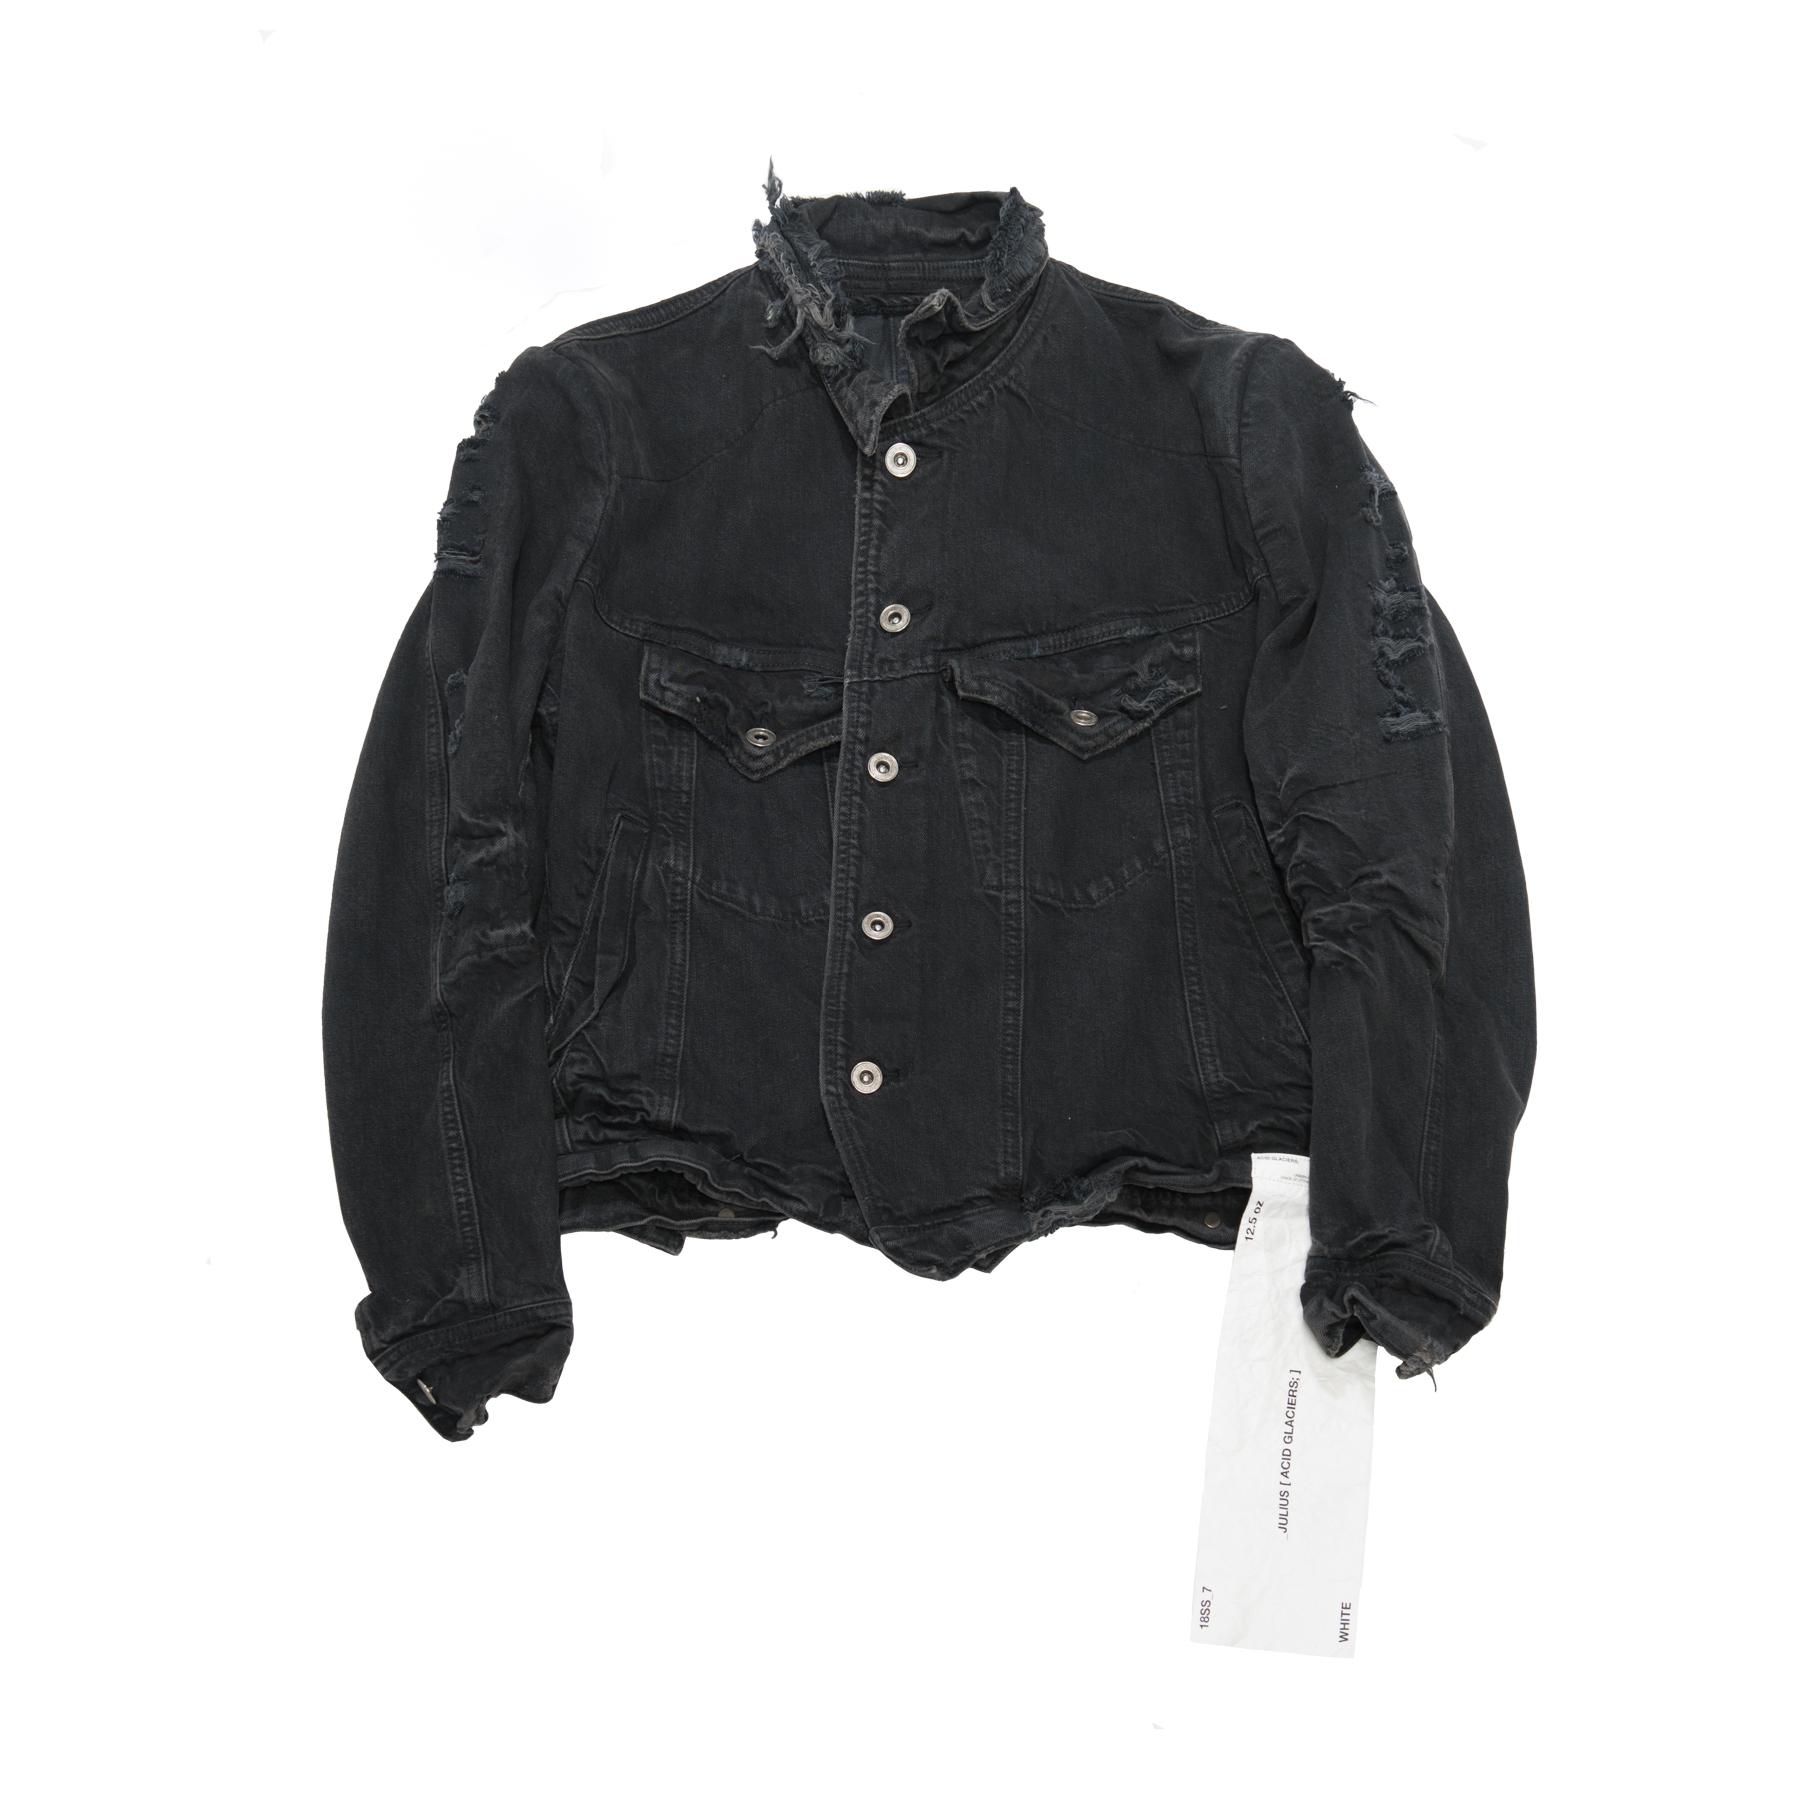 007BLM31-BLACK / G I ジャケット